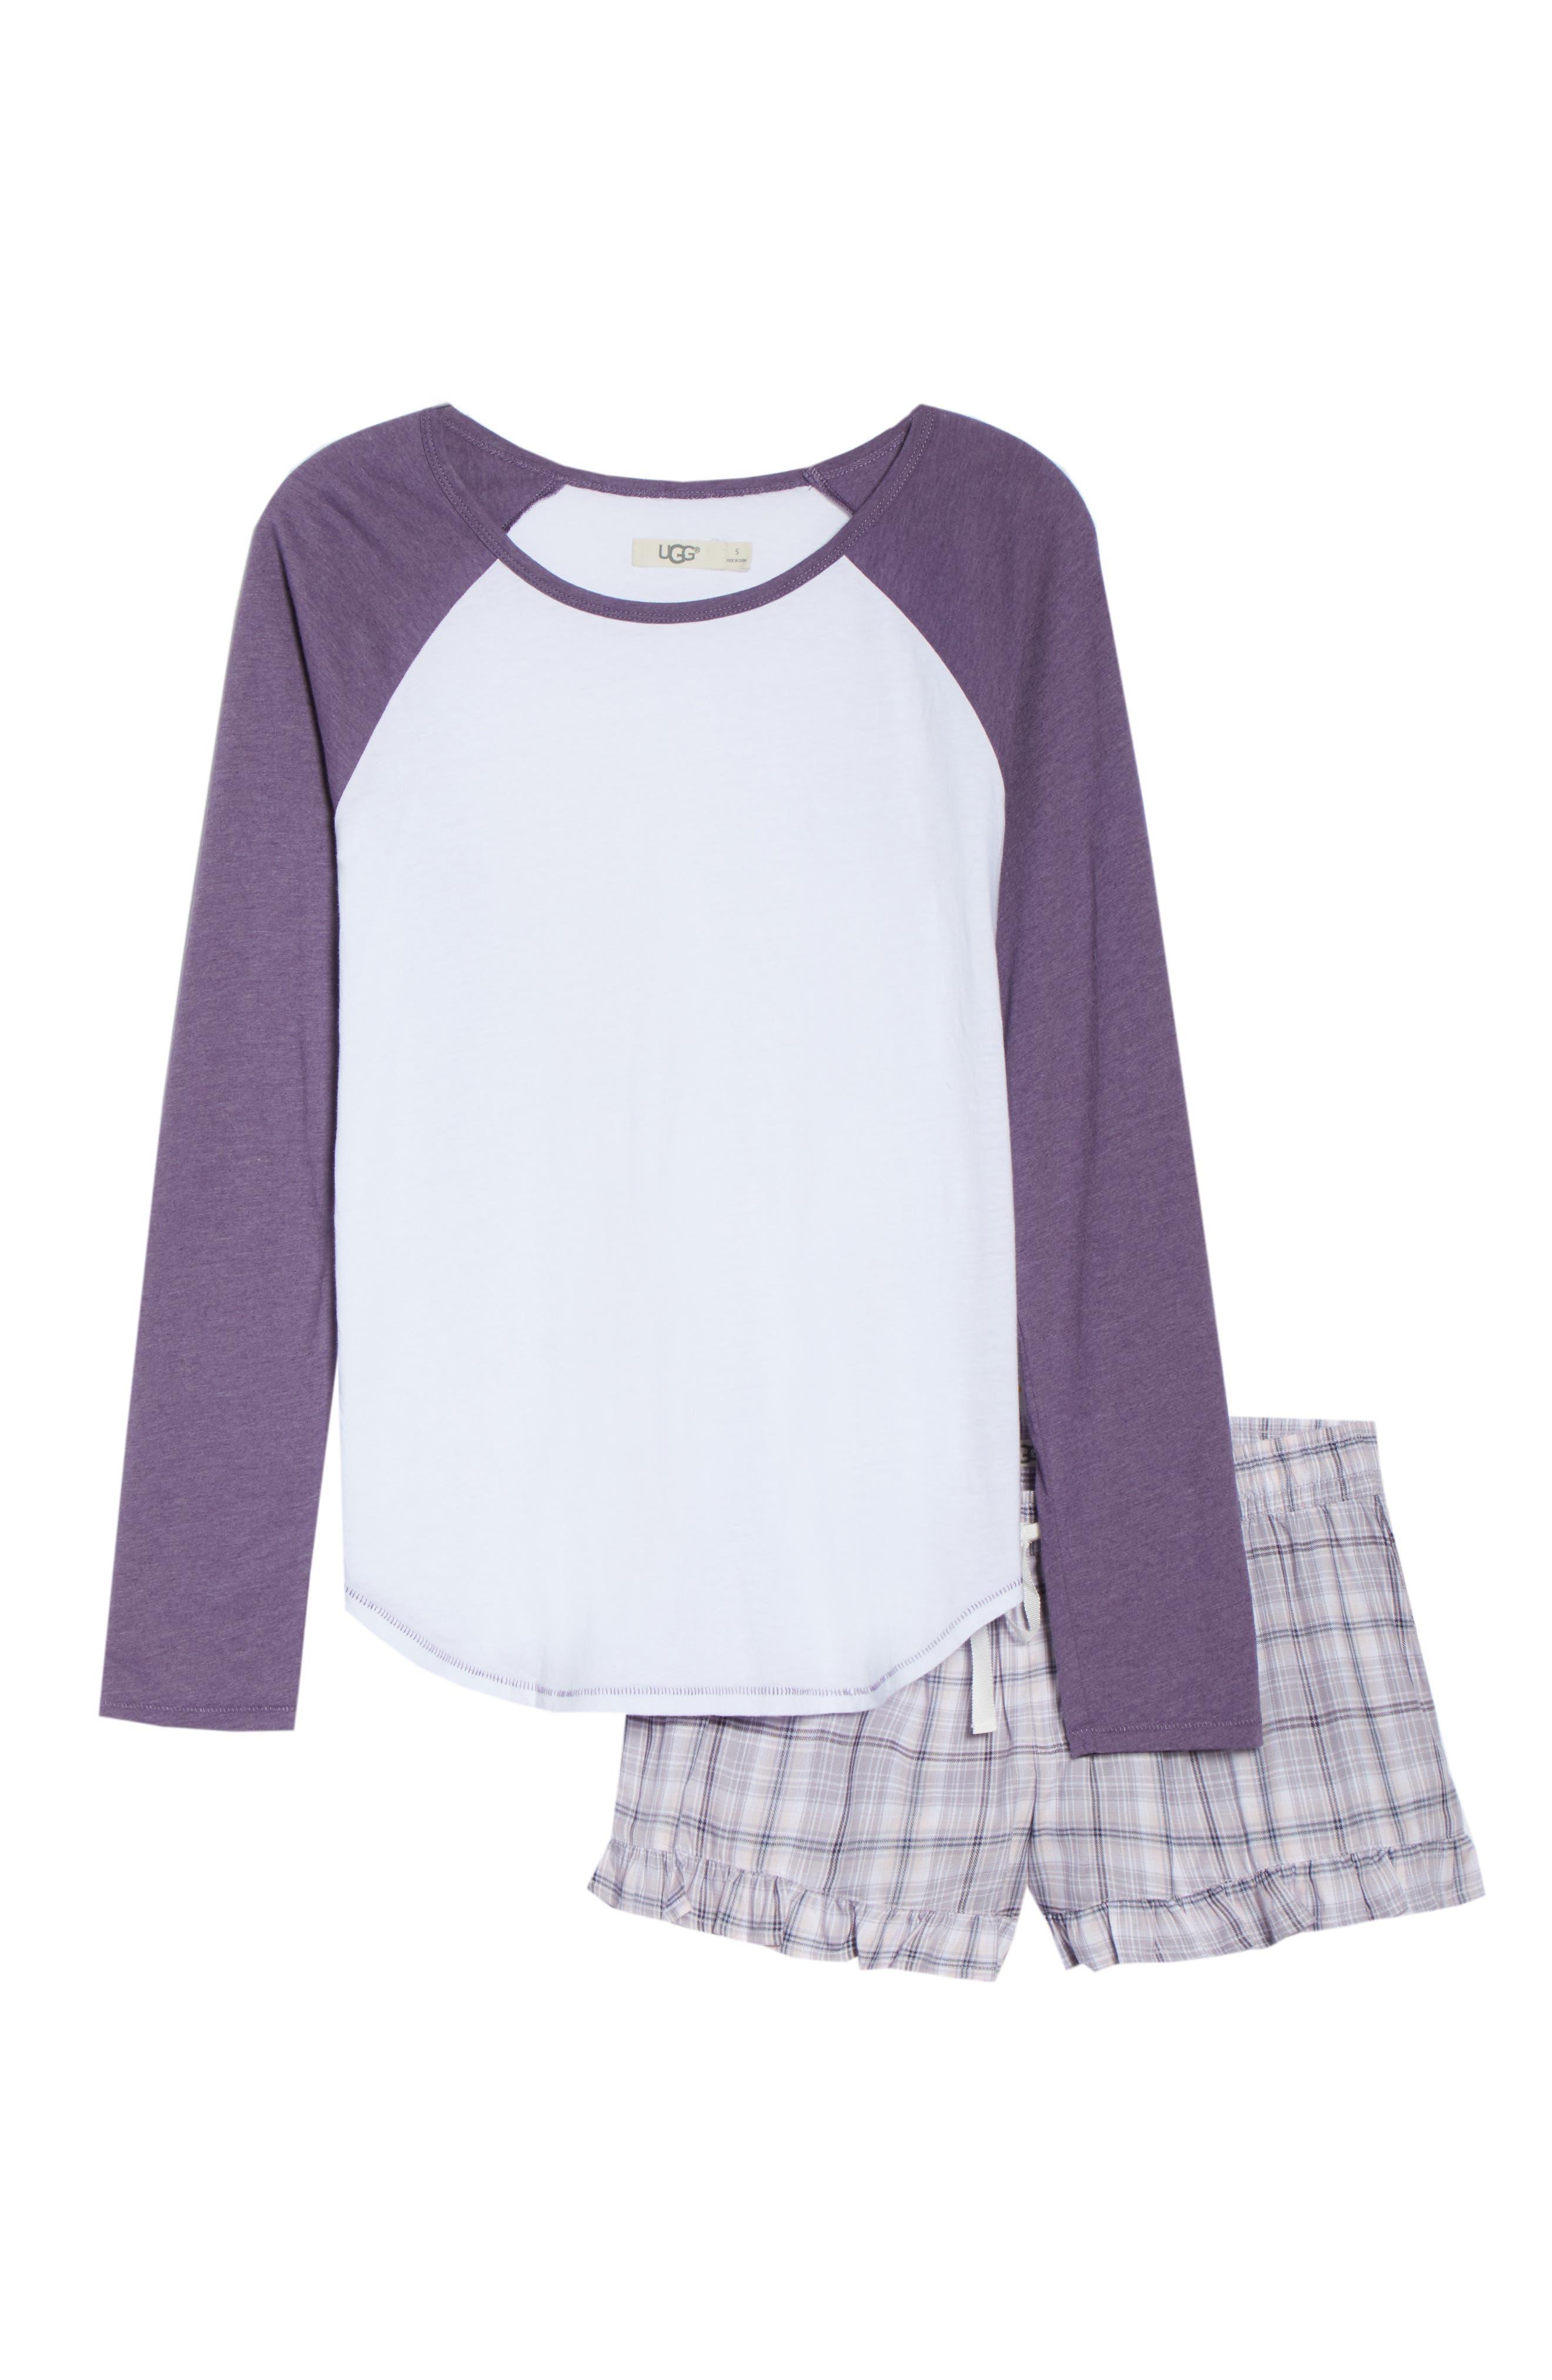 Charly Short Pajamas,                             Alternate thumbnail 6, color,                             LAVENDER AURA PLAID